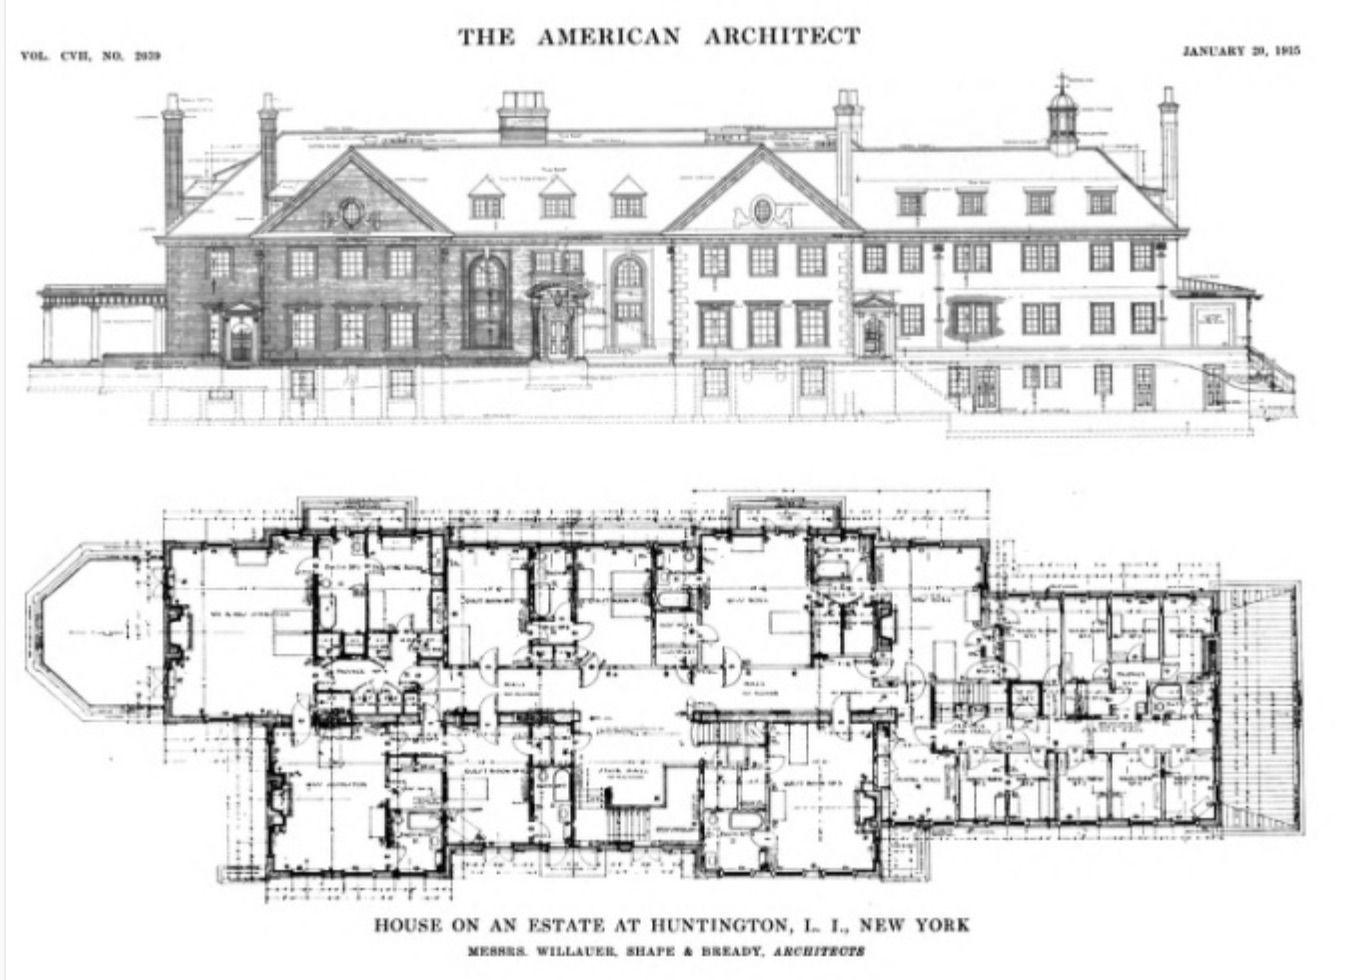 Long Island Mansion Plan 2 Mansion Plans Long Island Mansion Architecture Plan